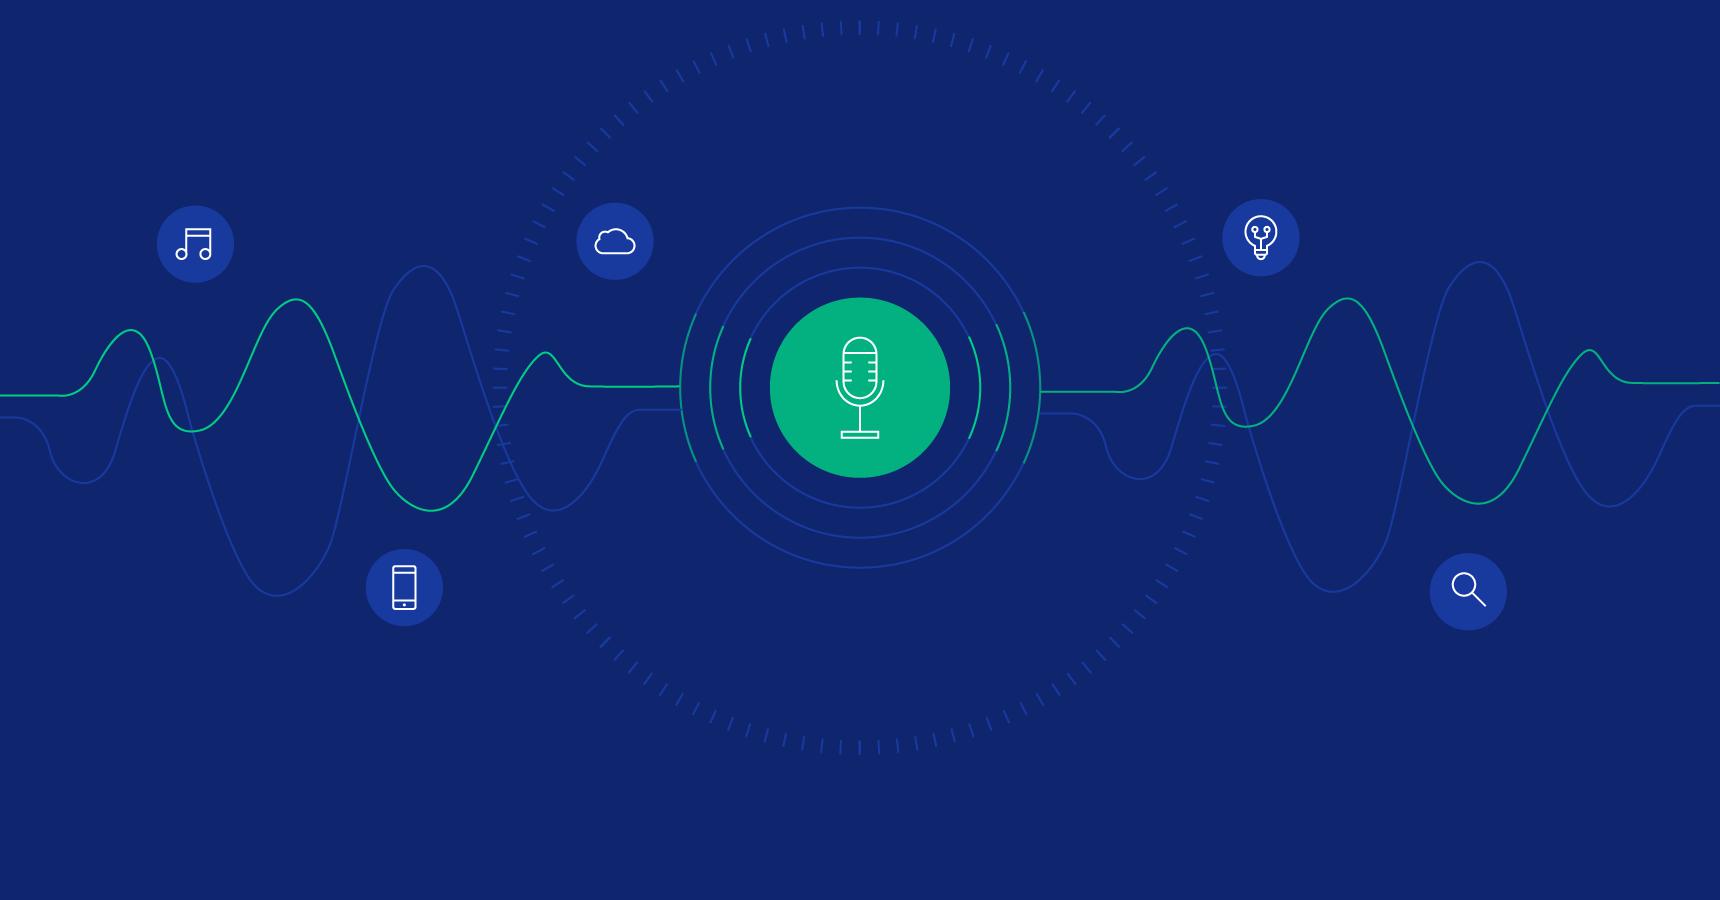 Designing a VUI – Voice User Interface | Toptal